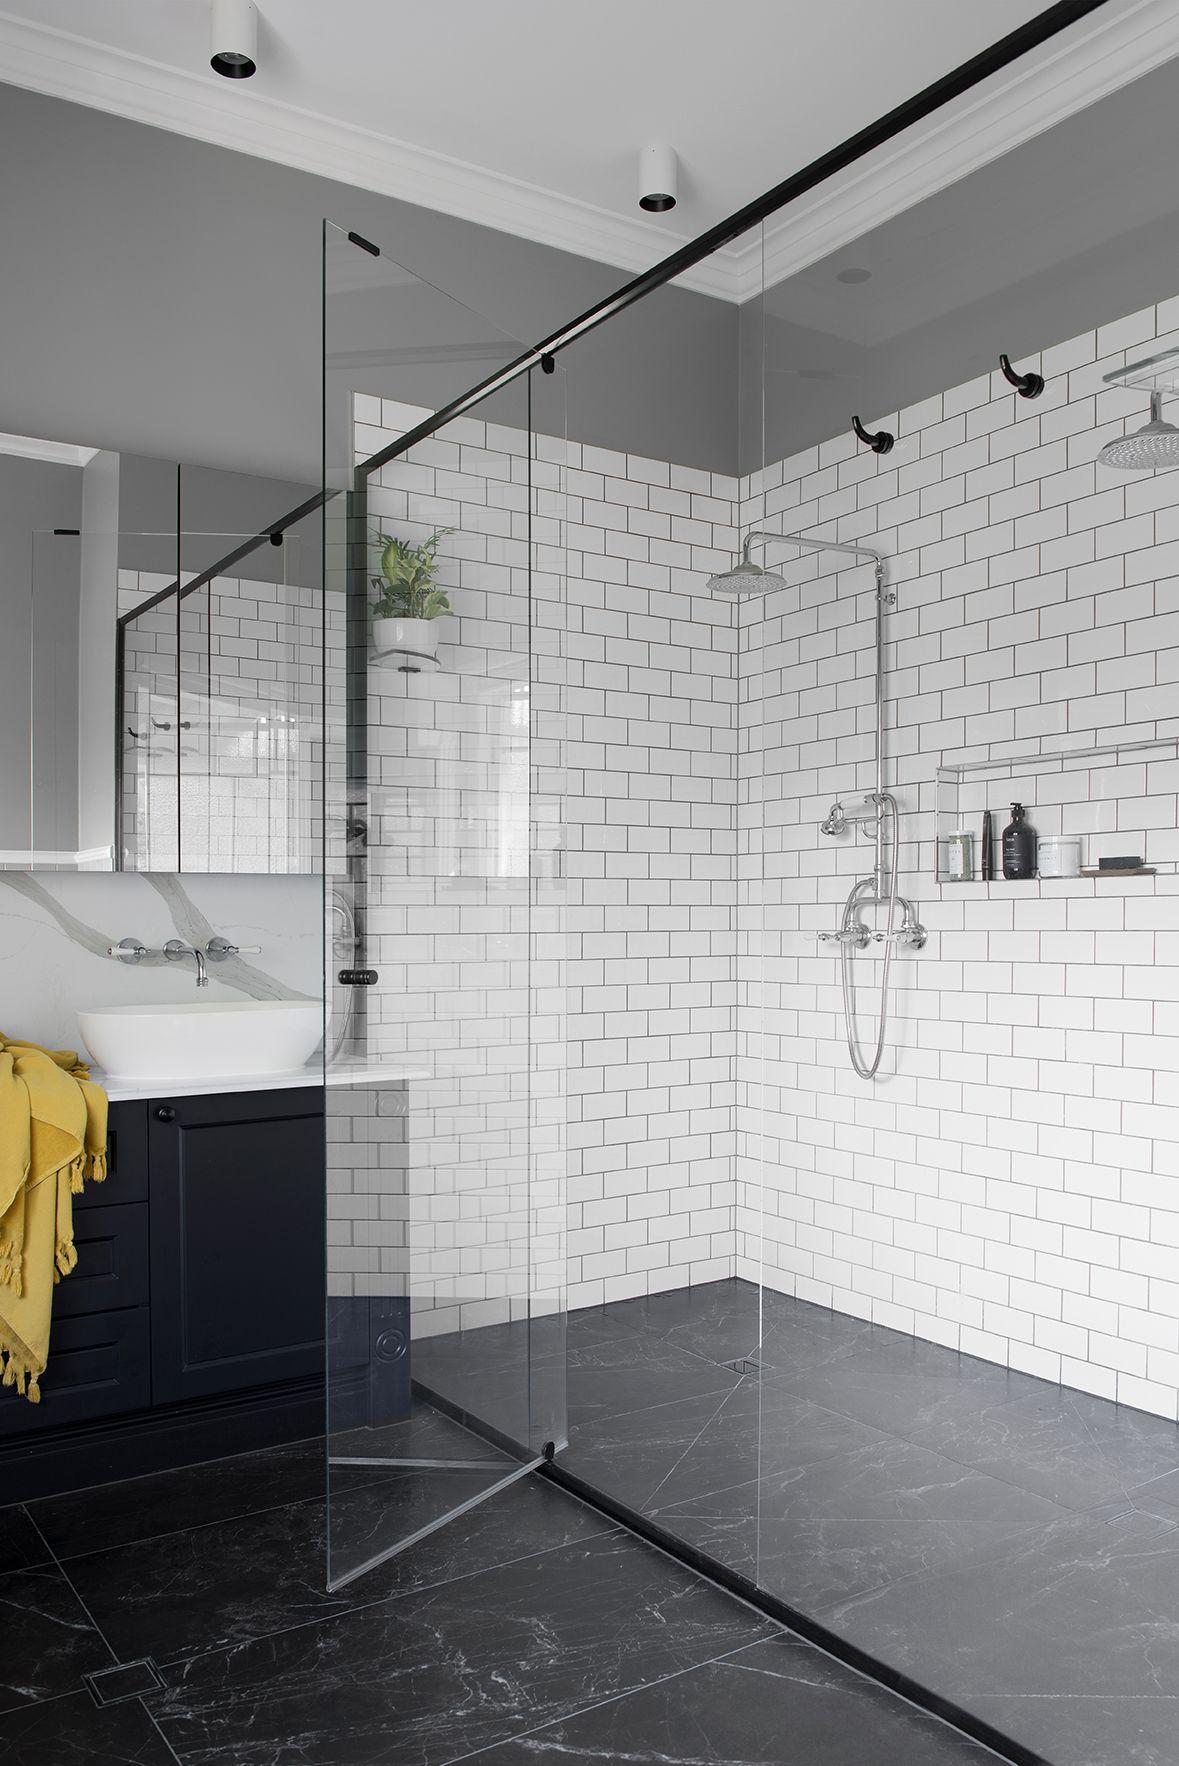 Queenslander bathroom. Subway tiles. Shaker cabinetry.  Bathroom